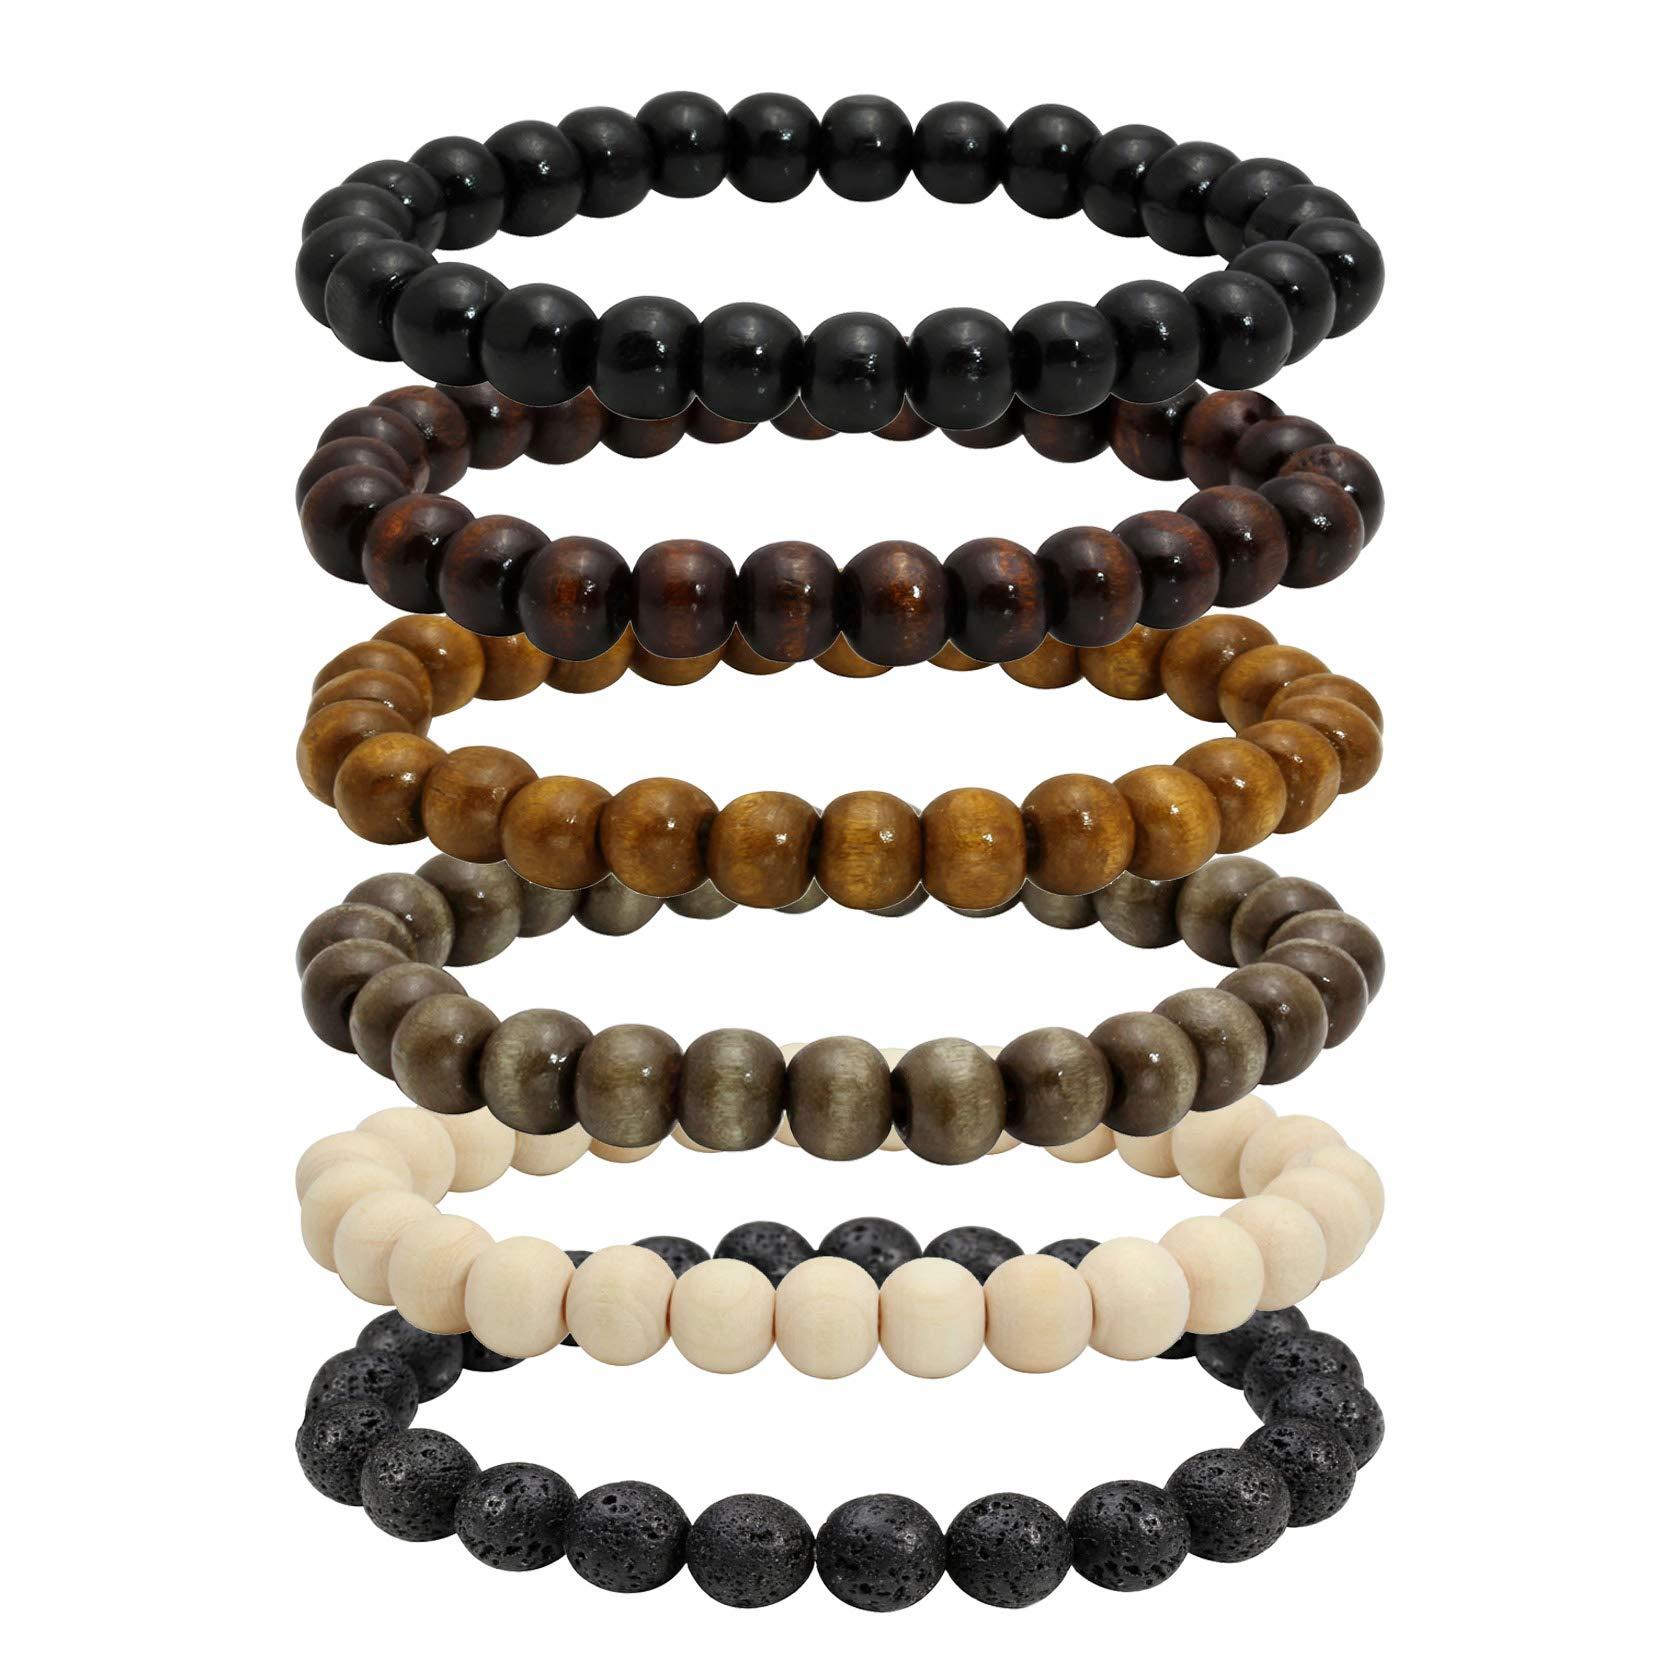 MILAKOO 10 Pcs 8mm Natural Wood Beads Bracelet Mala Prayer Beads Meditation Link Wrist